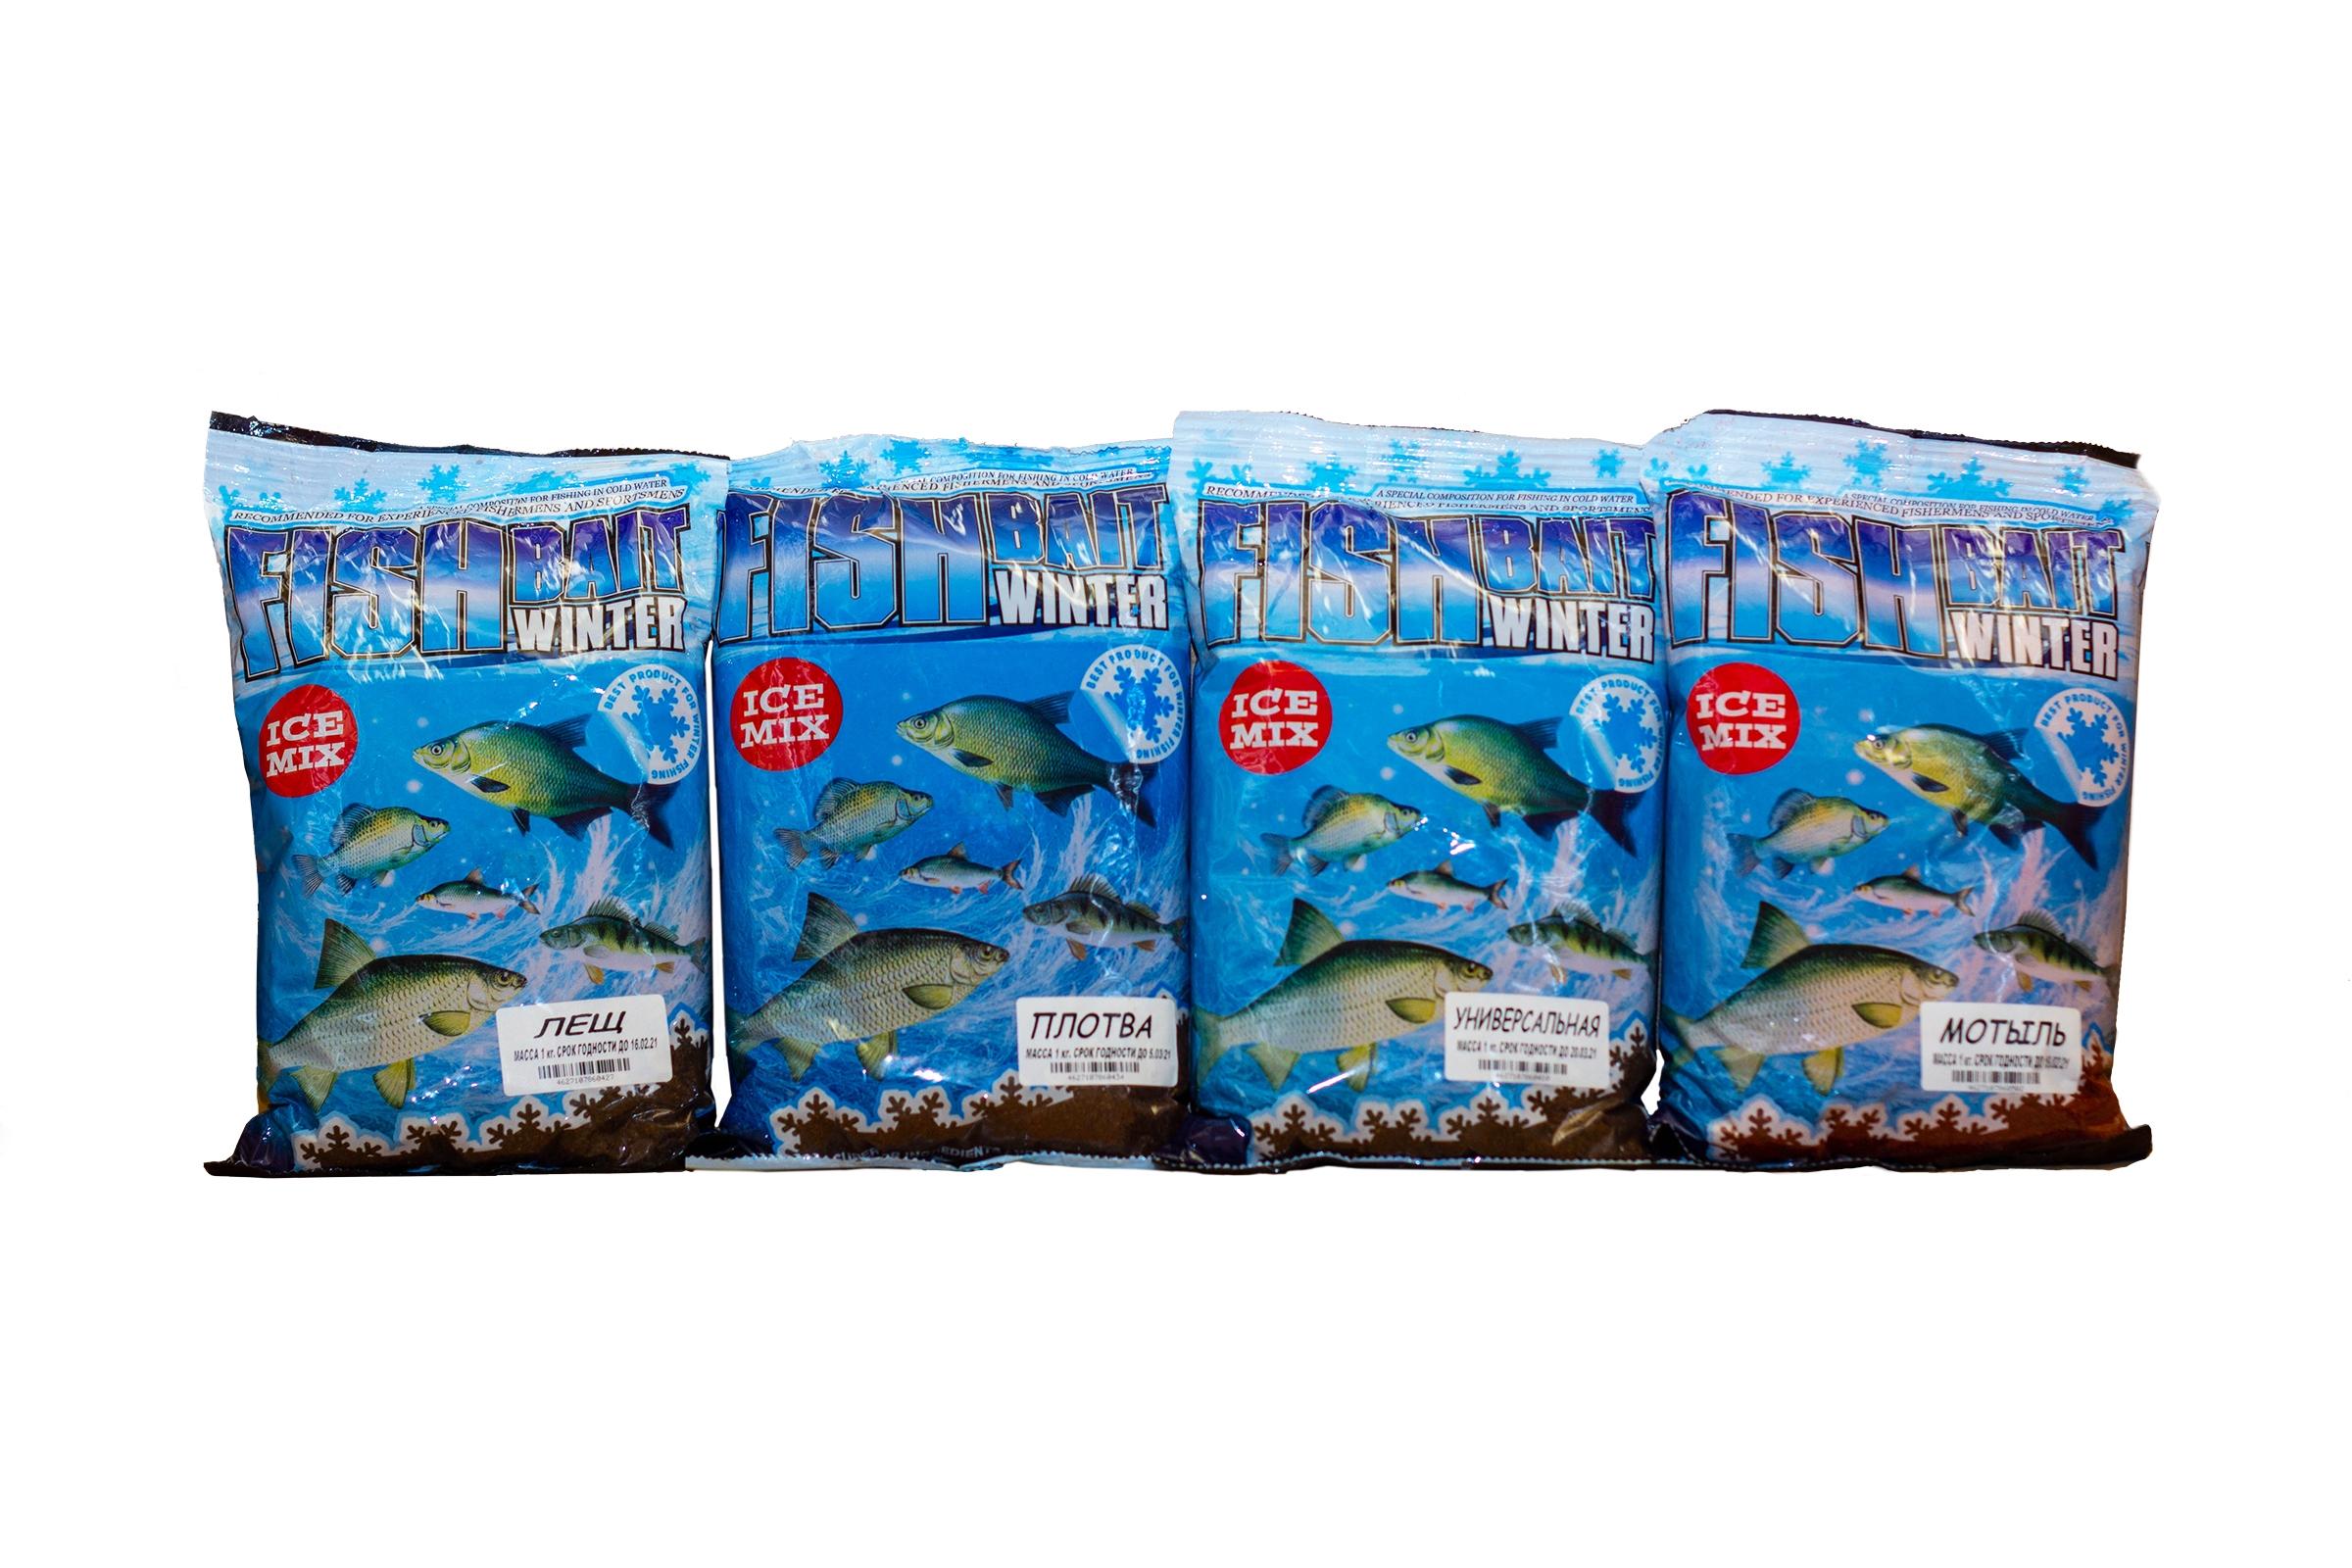 ПРИКОРМКА FISHBAIT ICE MIX WINTER (ФИШ БАЙТ ЗИМНИЙ МИКС) лещ, плотва, мотыль, универсальная